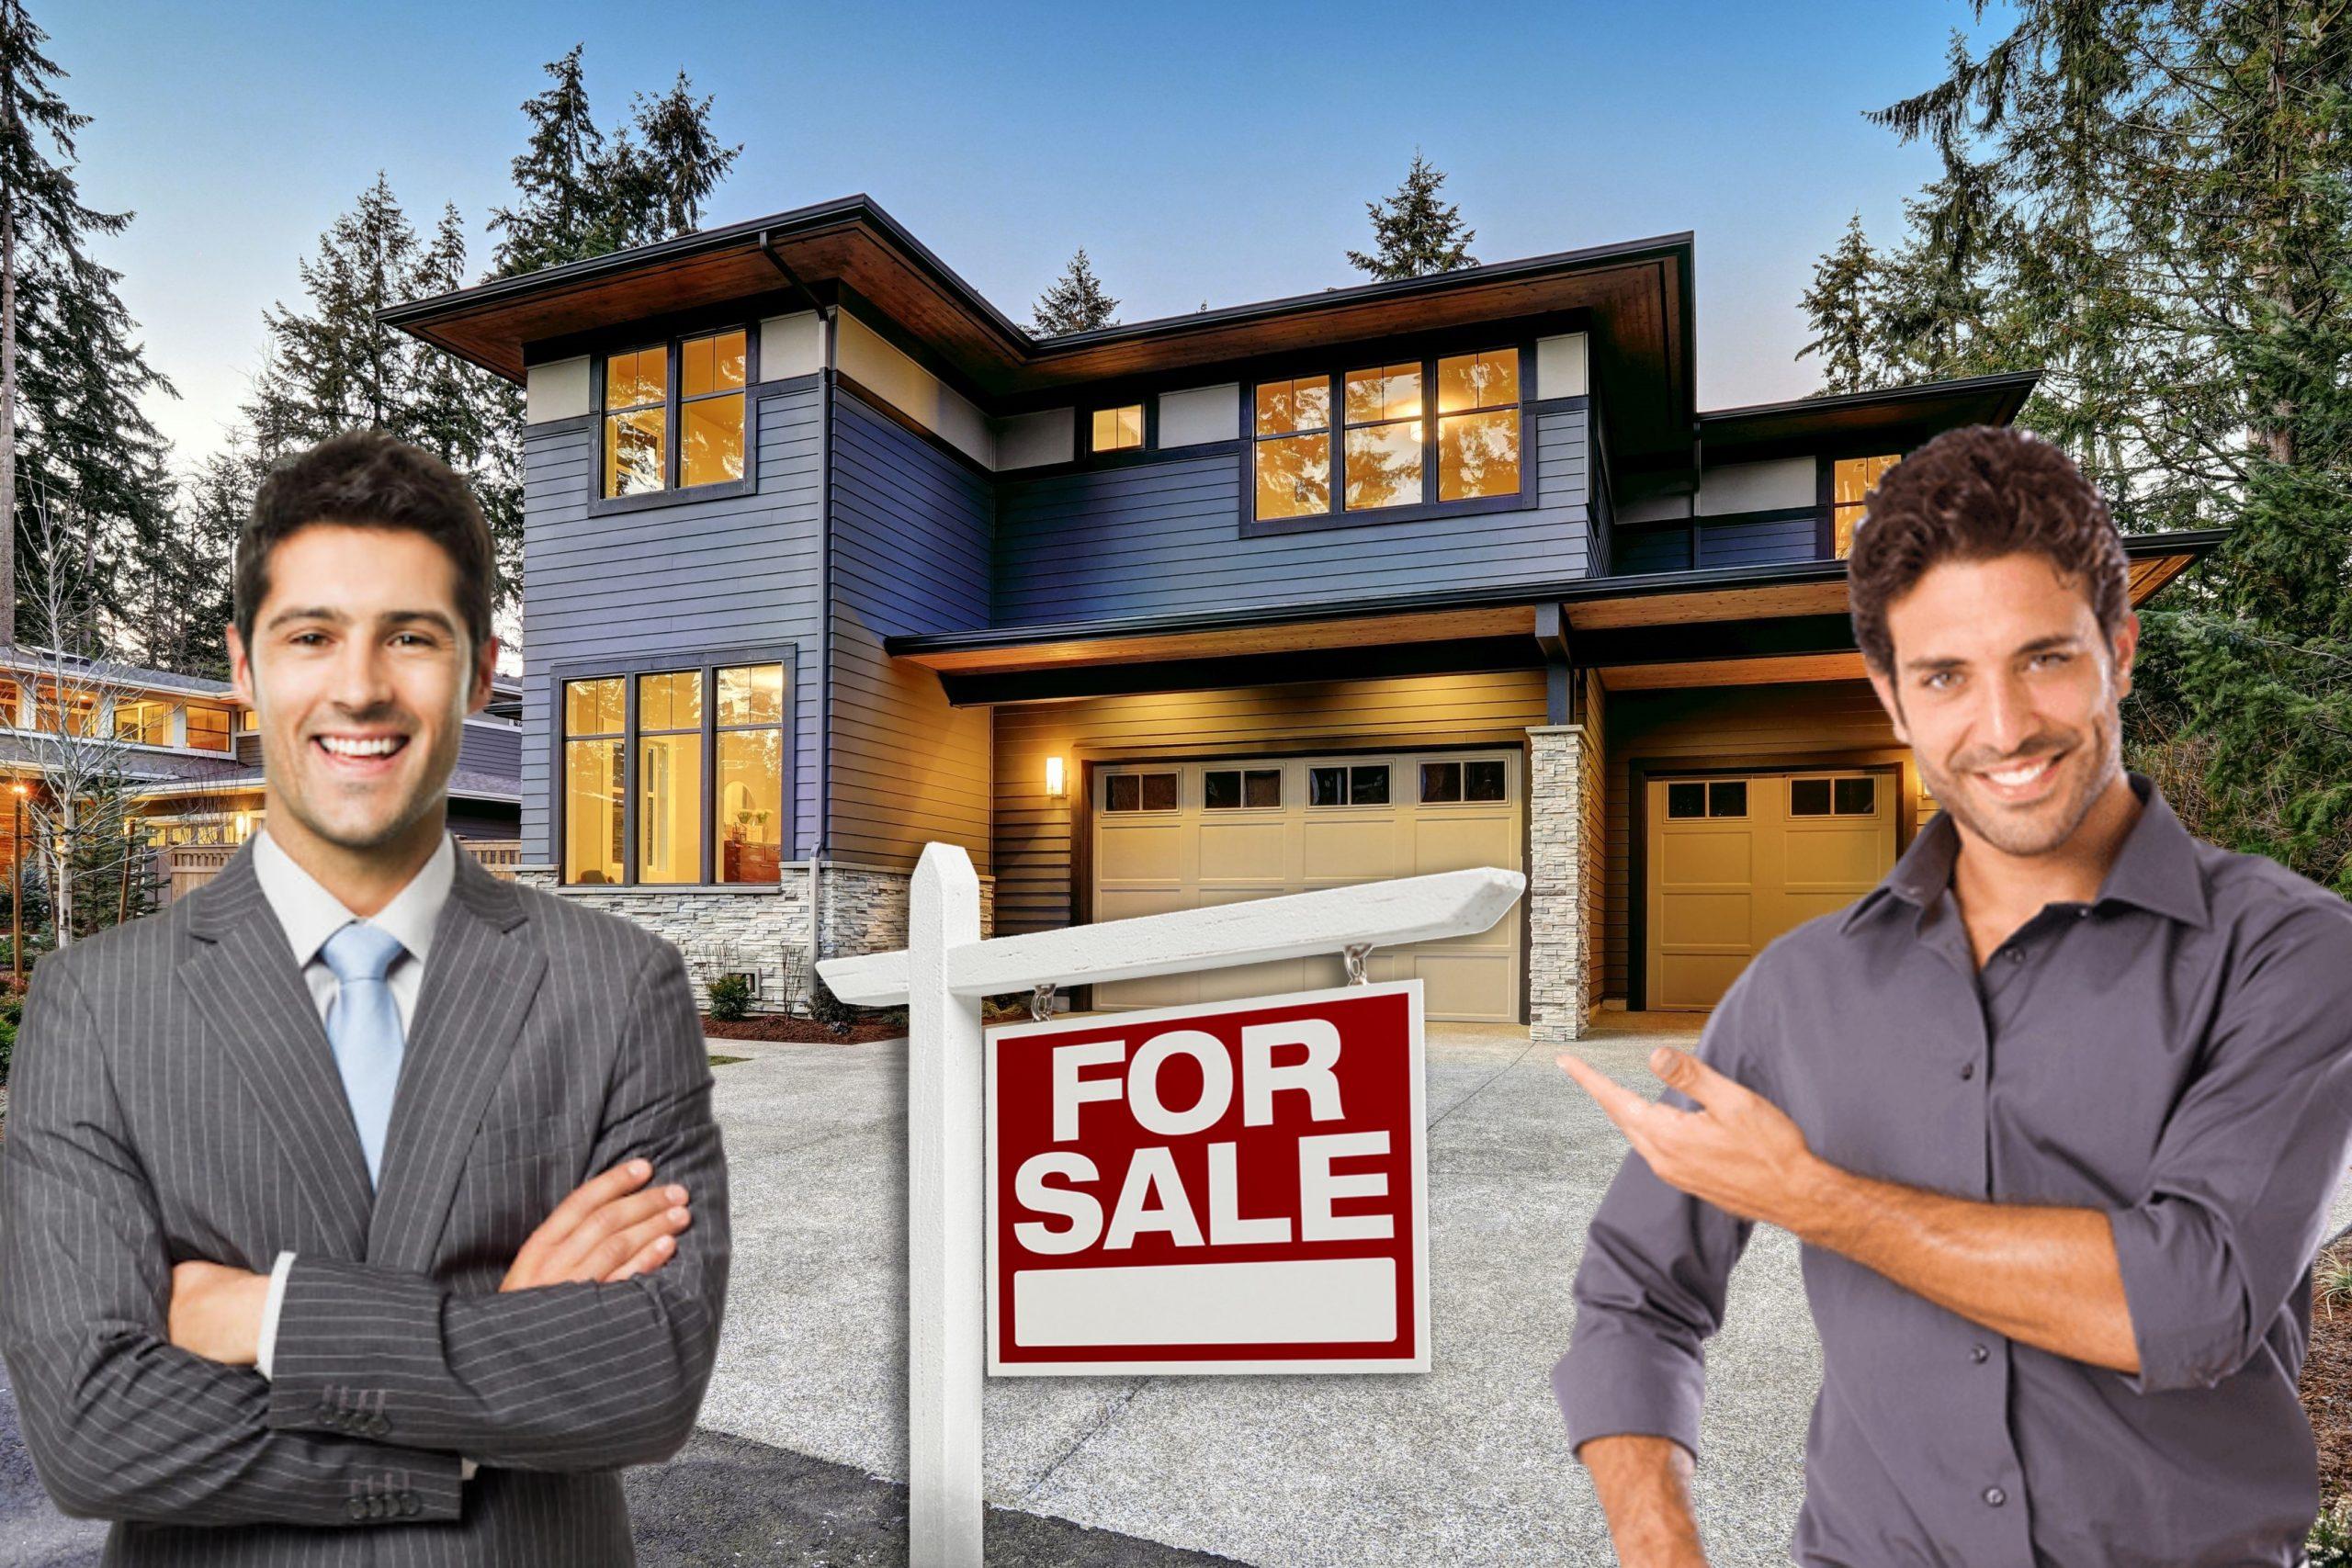 maisons marche immobilier boom